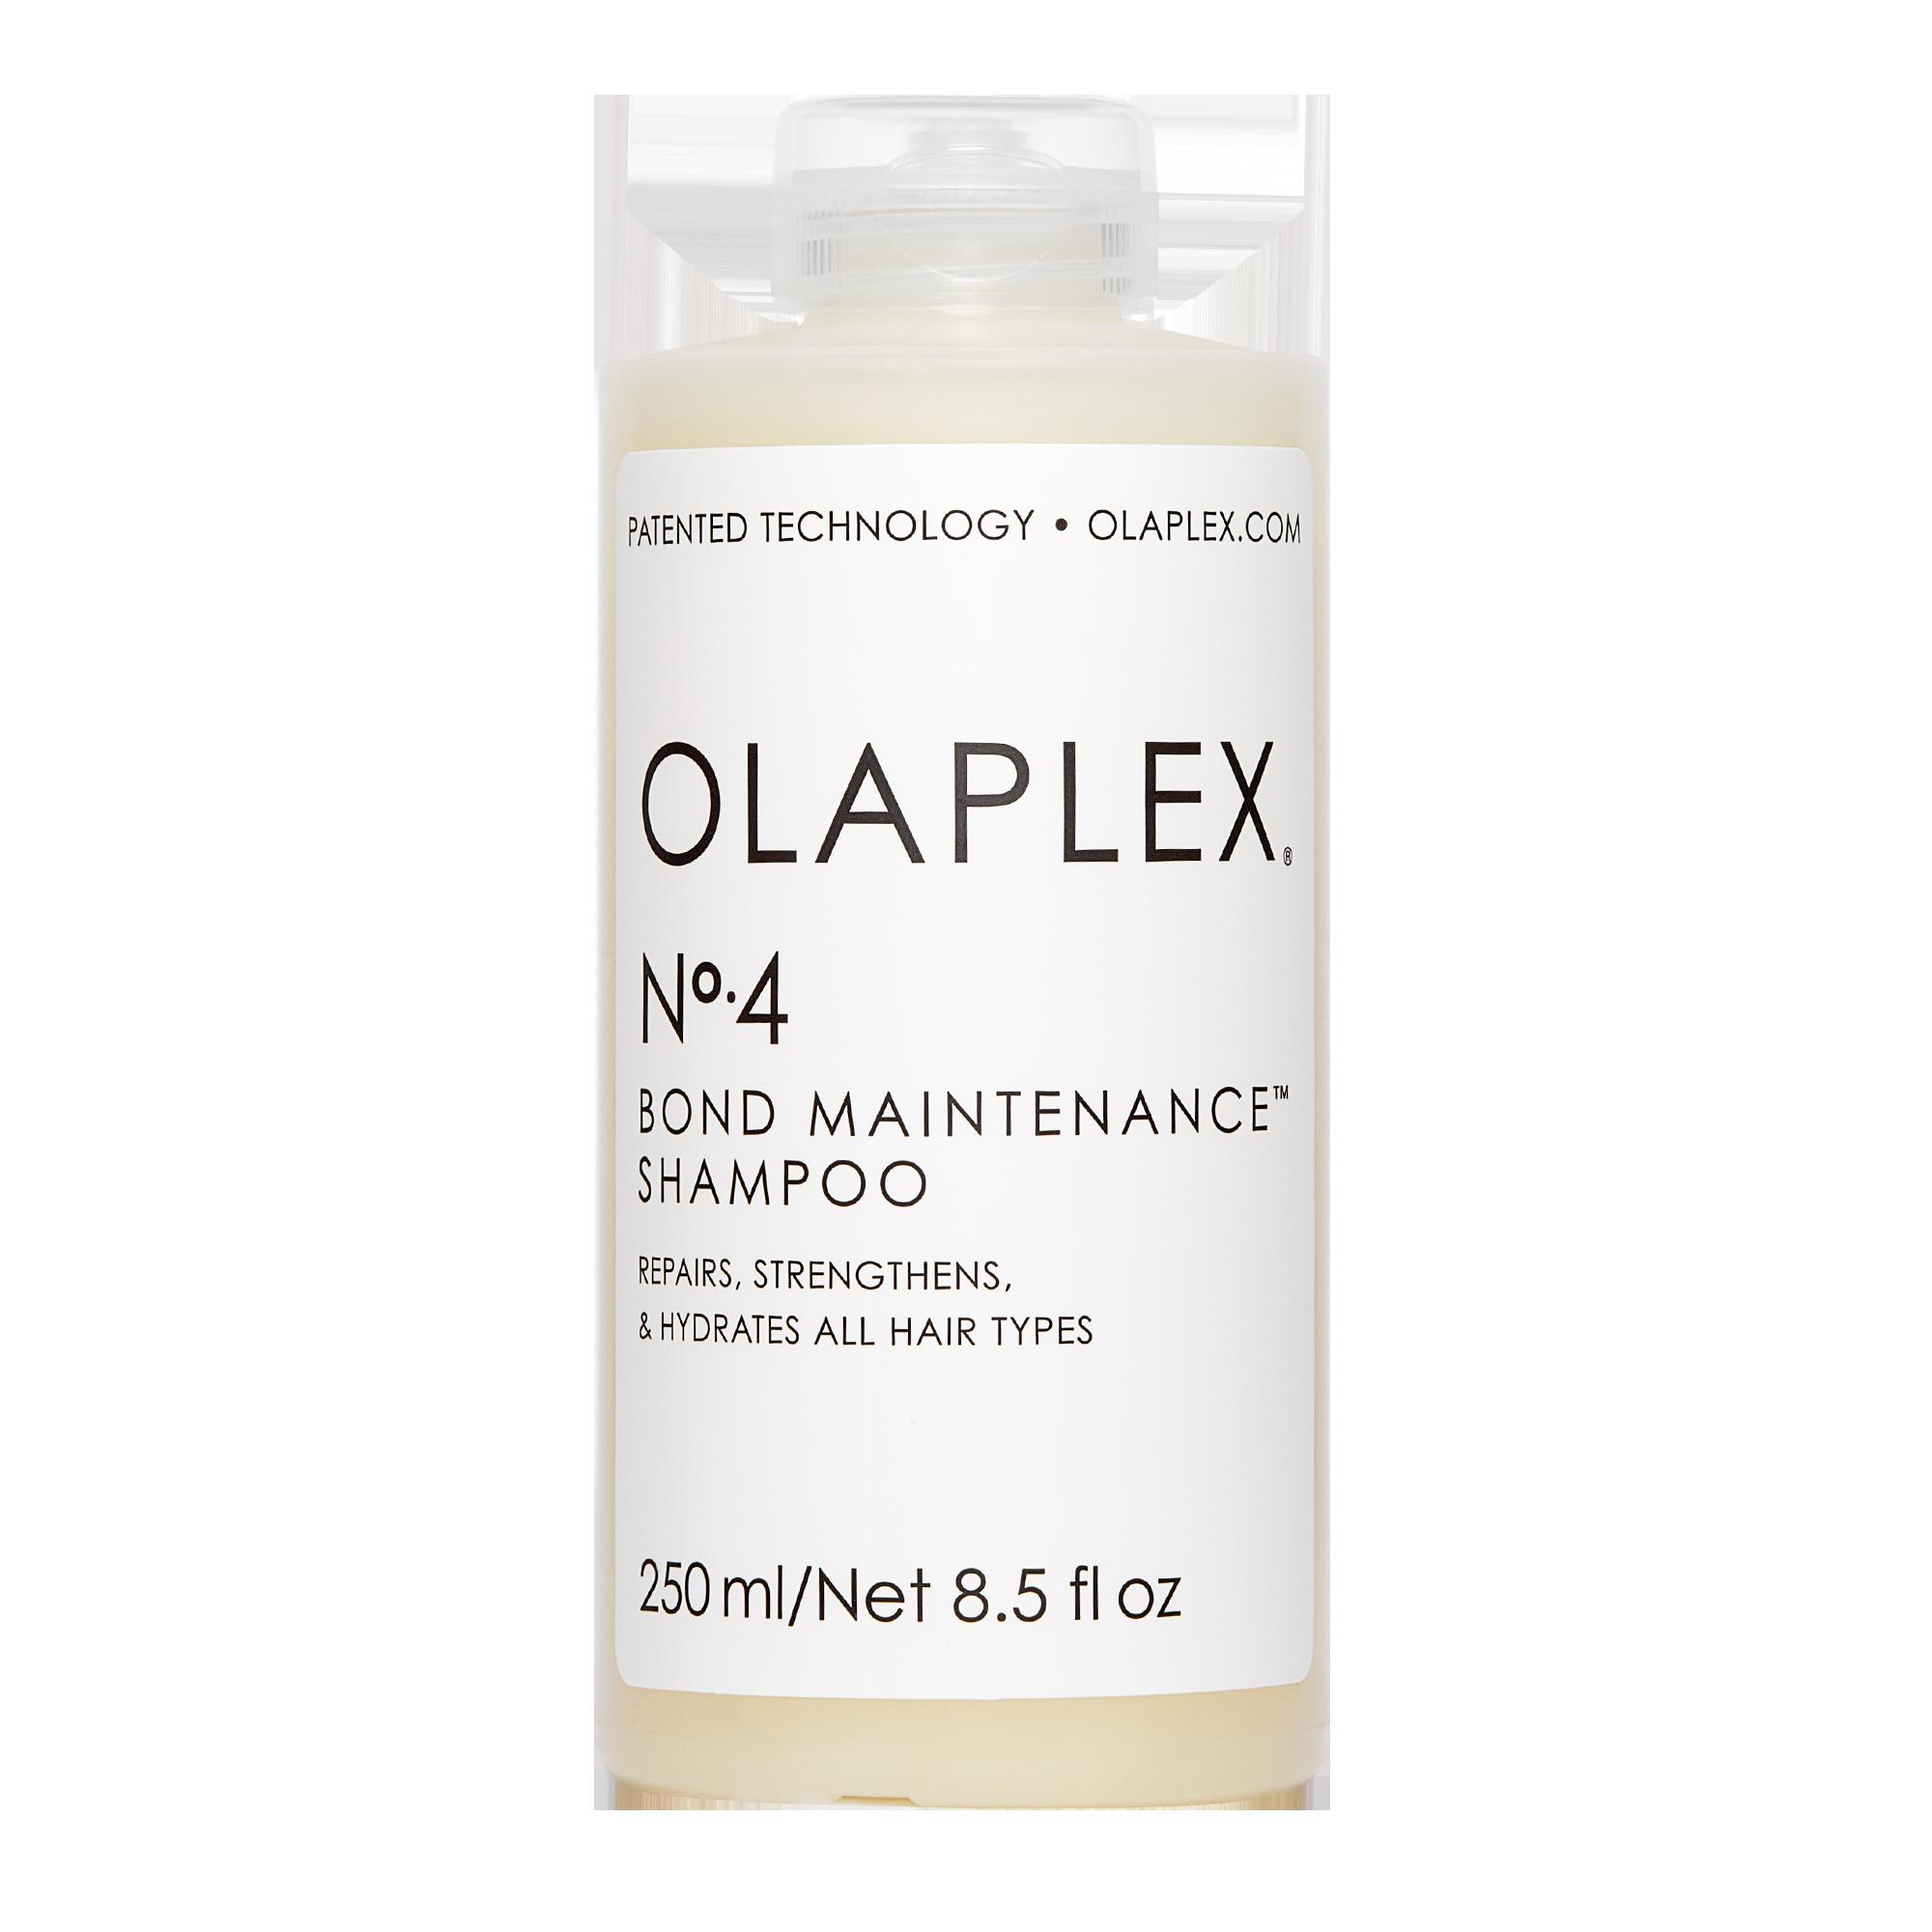 OLAPLEX® N° 4 Shampoo grid image